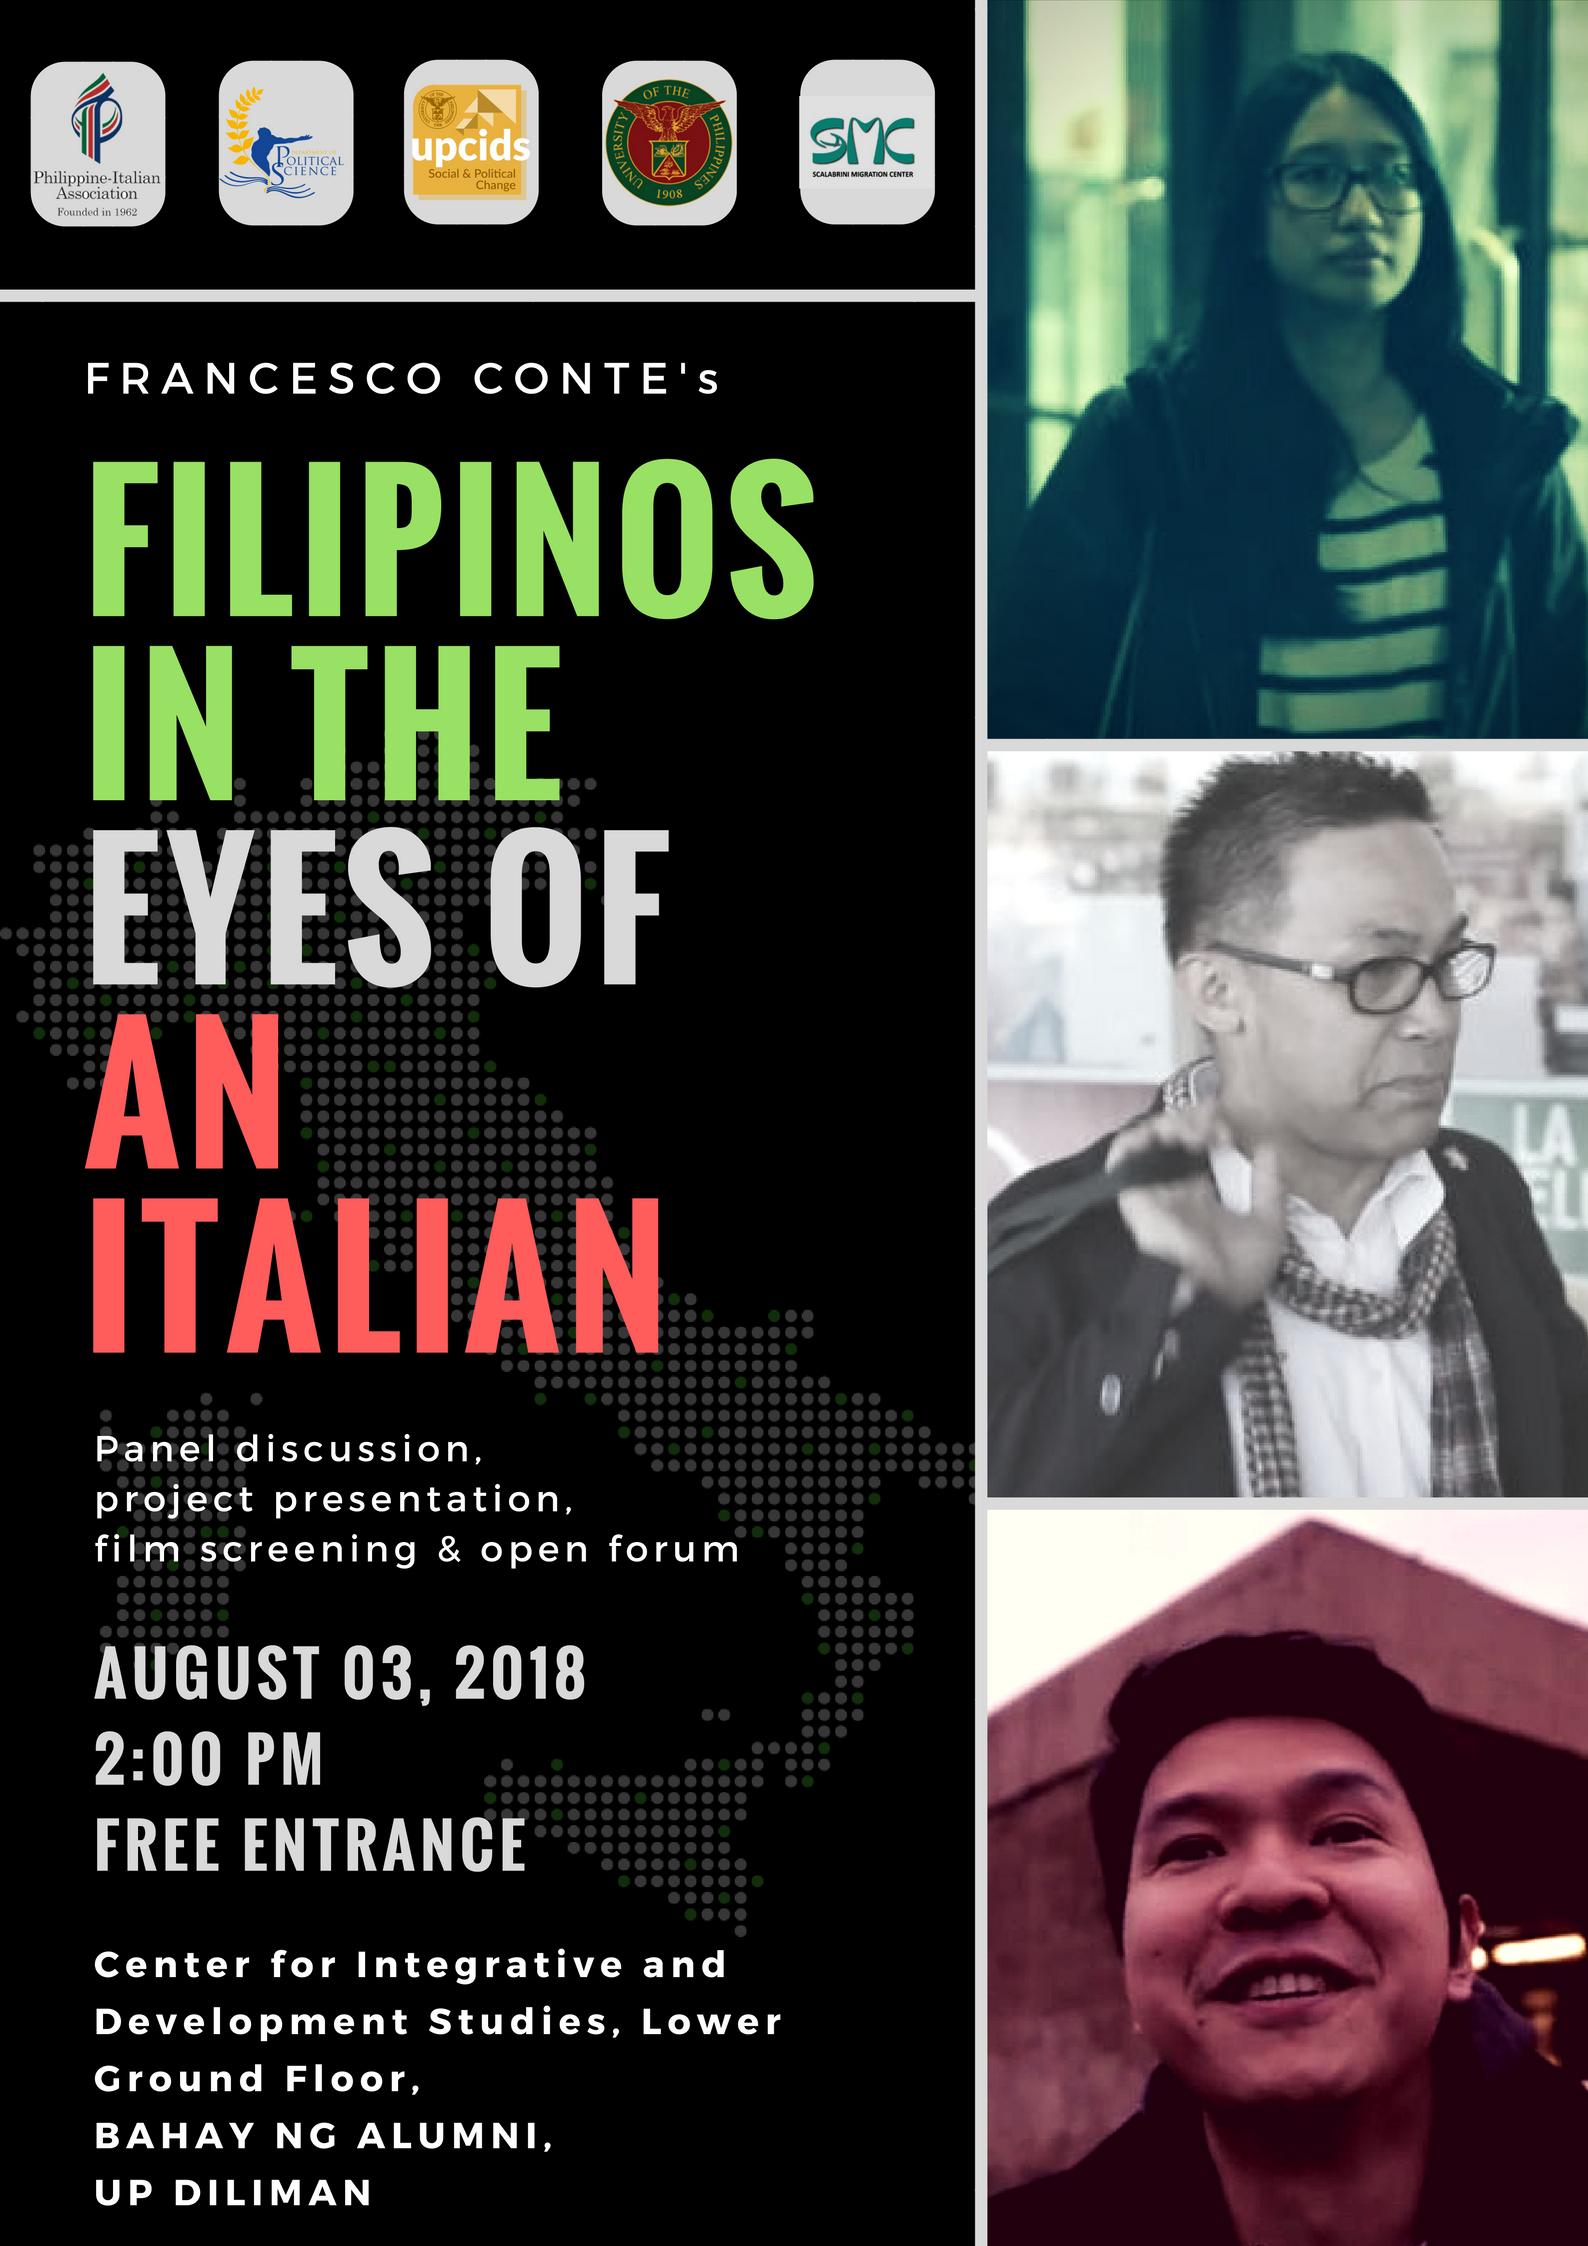 Filipinos in the eyes of an italian.jpg